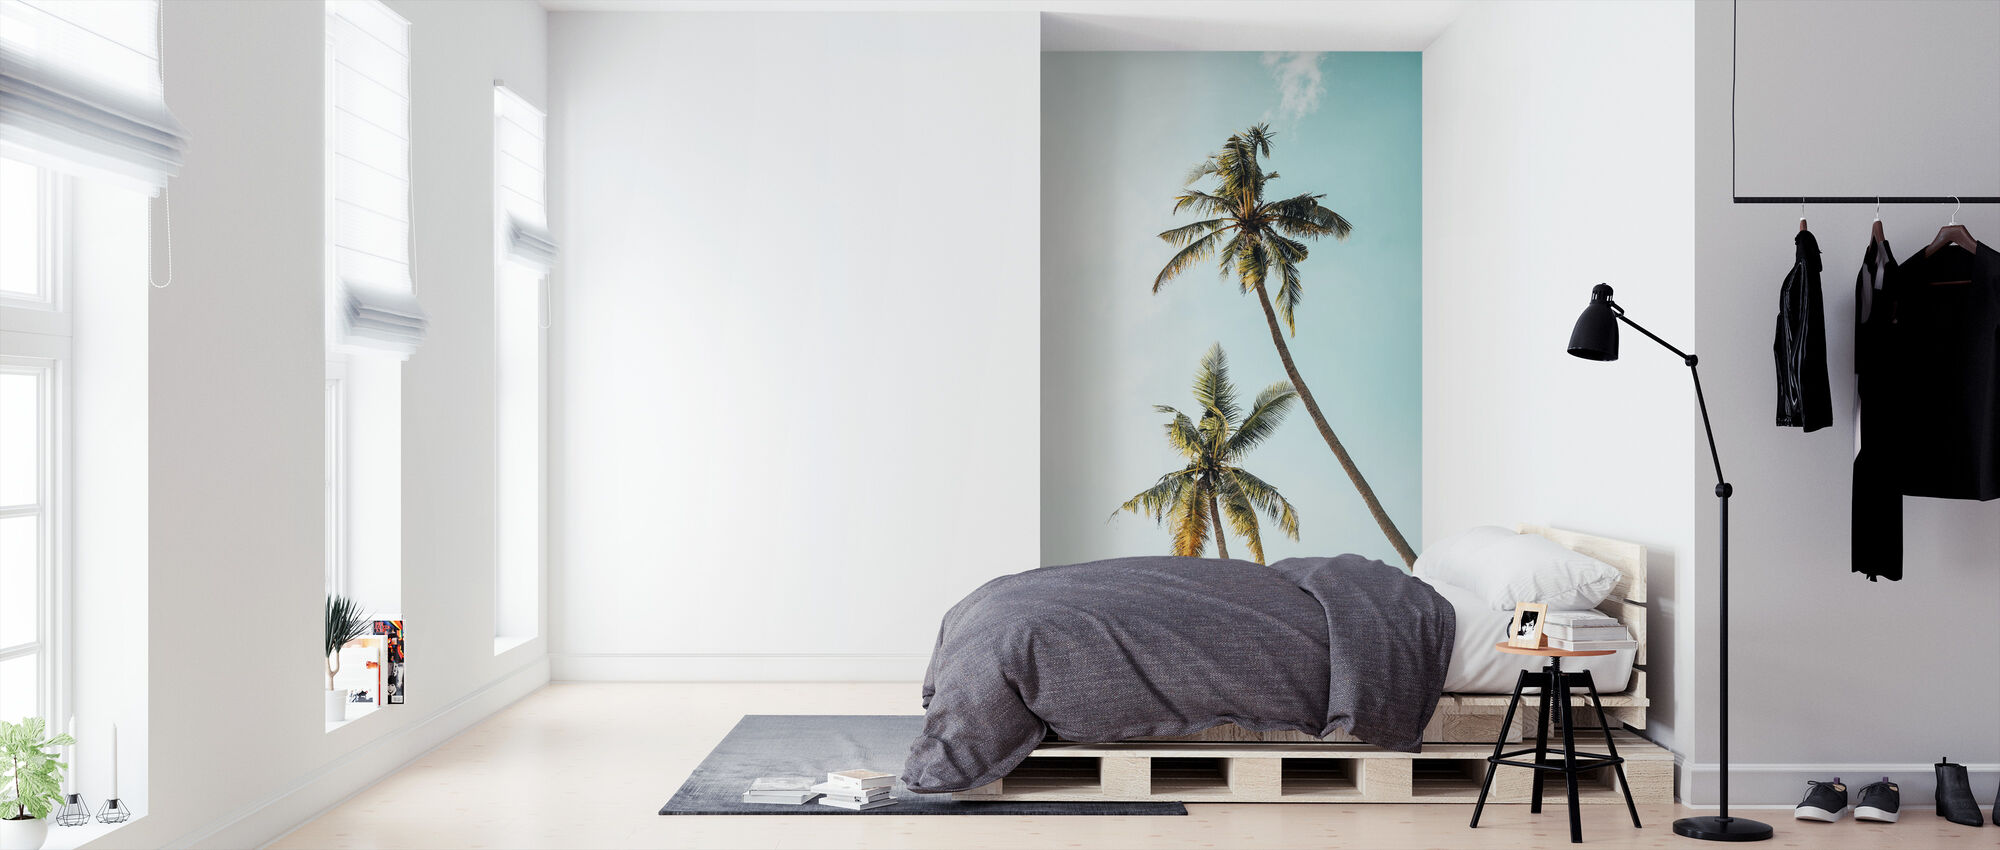 Coconut Palm Tree - Wallpaper - Bedroom